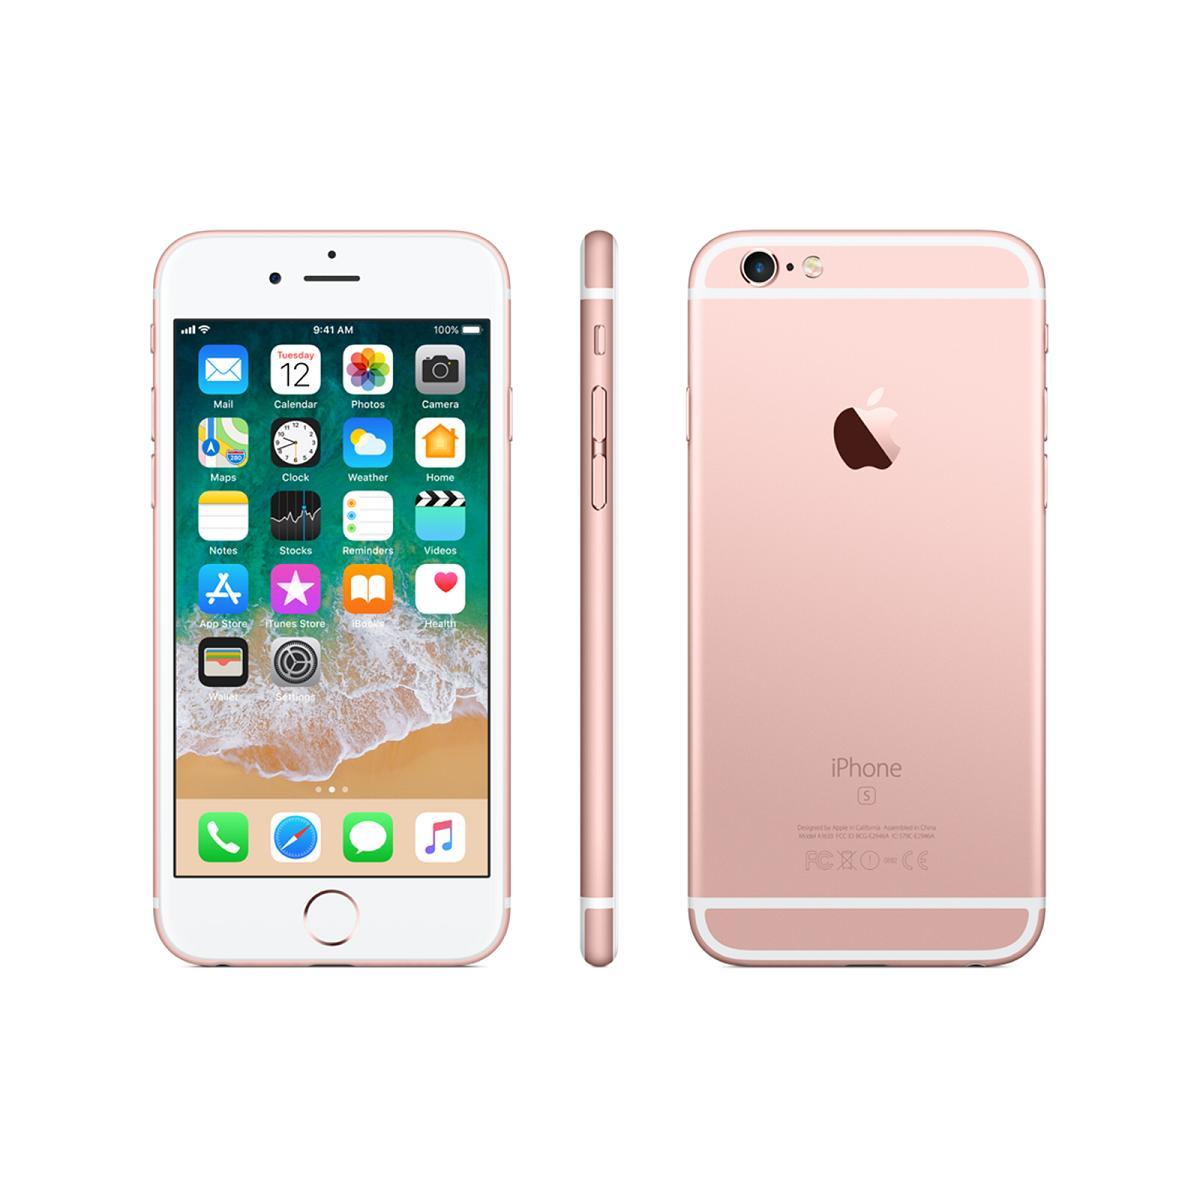 iPhone 6s 32GB 本体 SIMフリー ローズゴールド 新品未開封 Apple 1年保証 アップル iPhone6s 正...